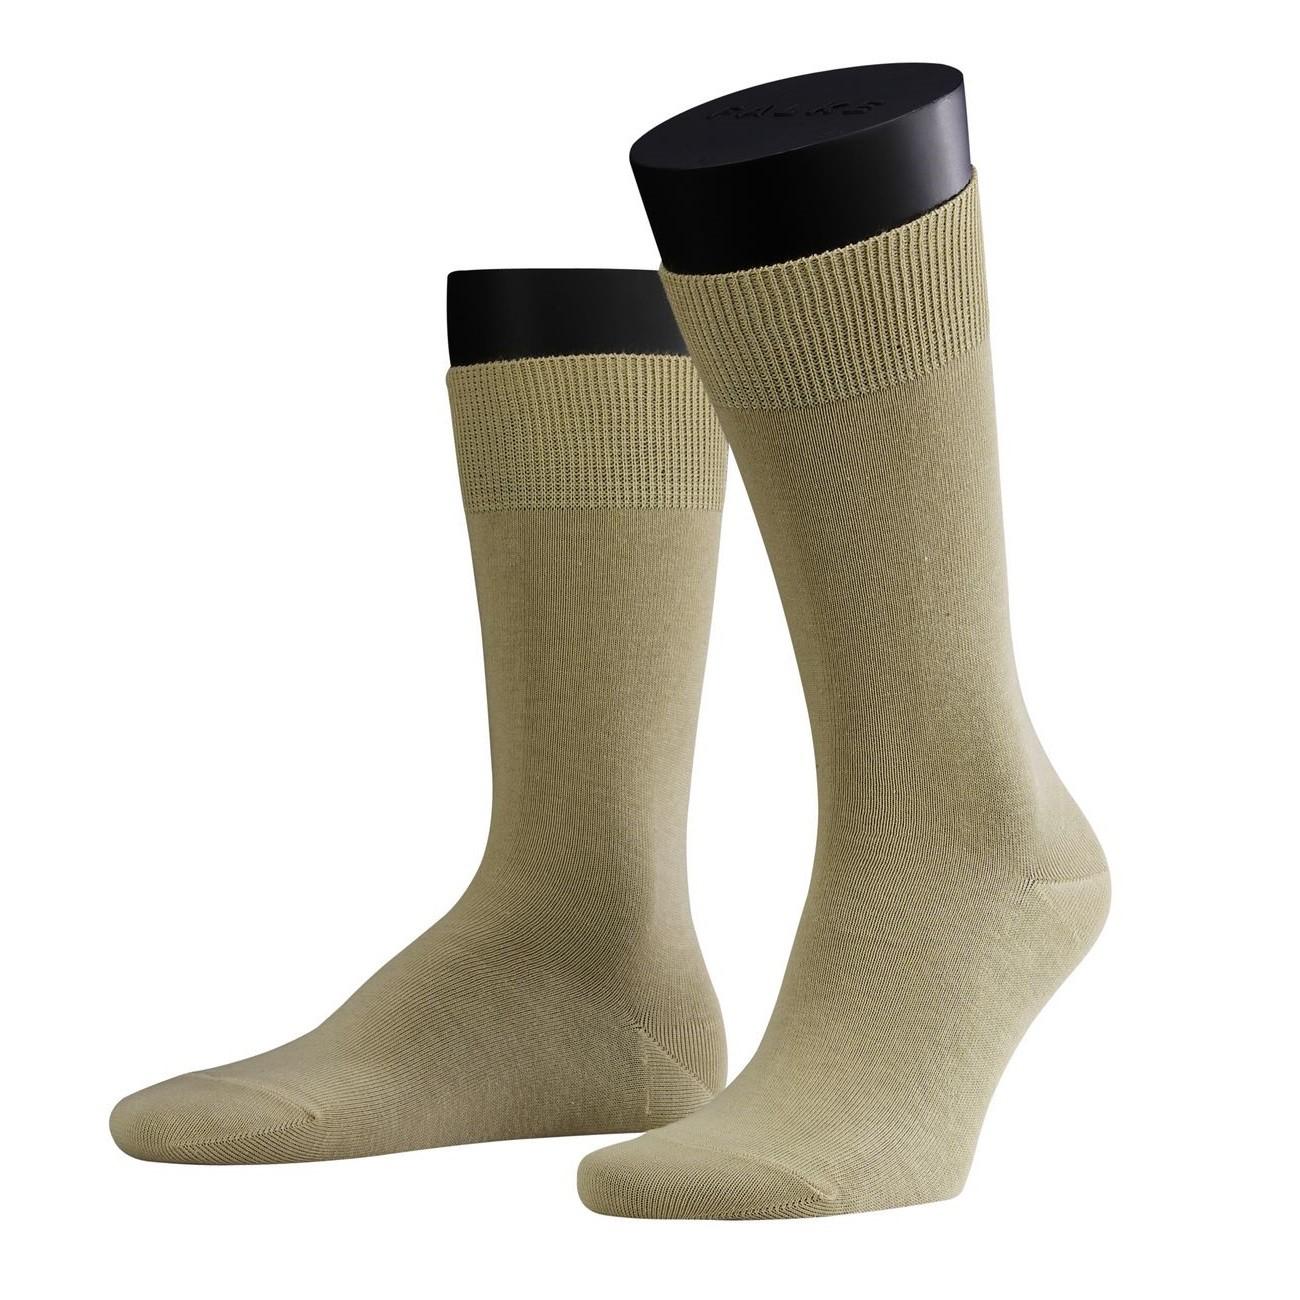 Kundschaft zuerst große sorten wie man bestellt Falke Socken Swing 2er Pack